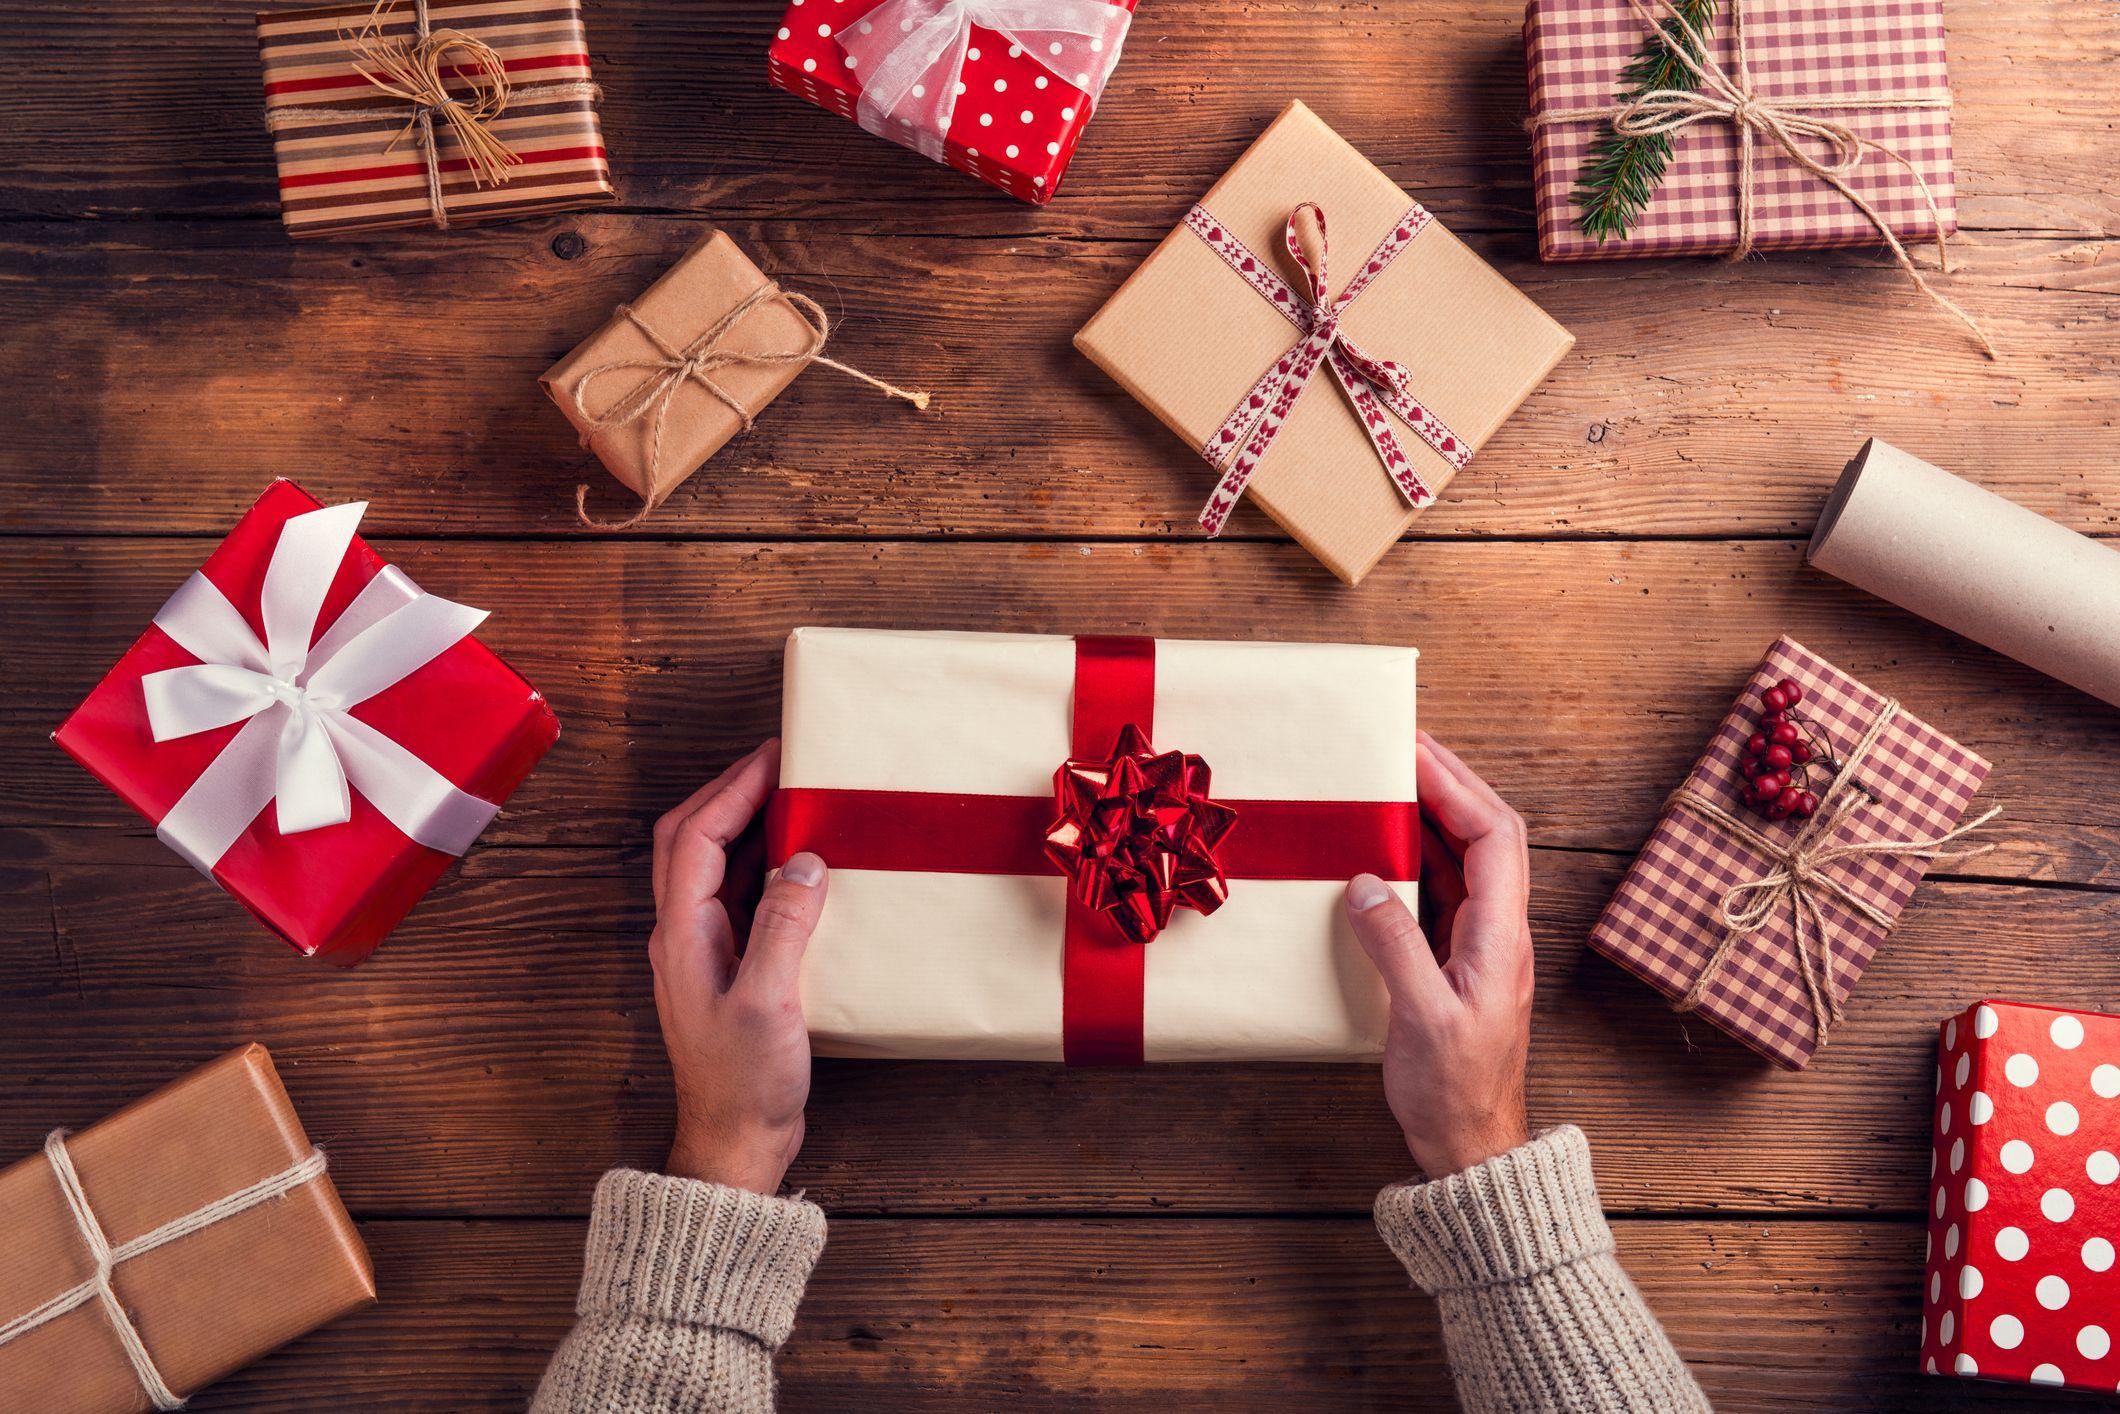 Bon jovi xmas gifts for dads